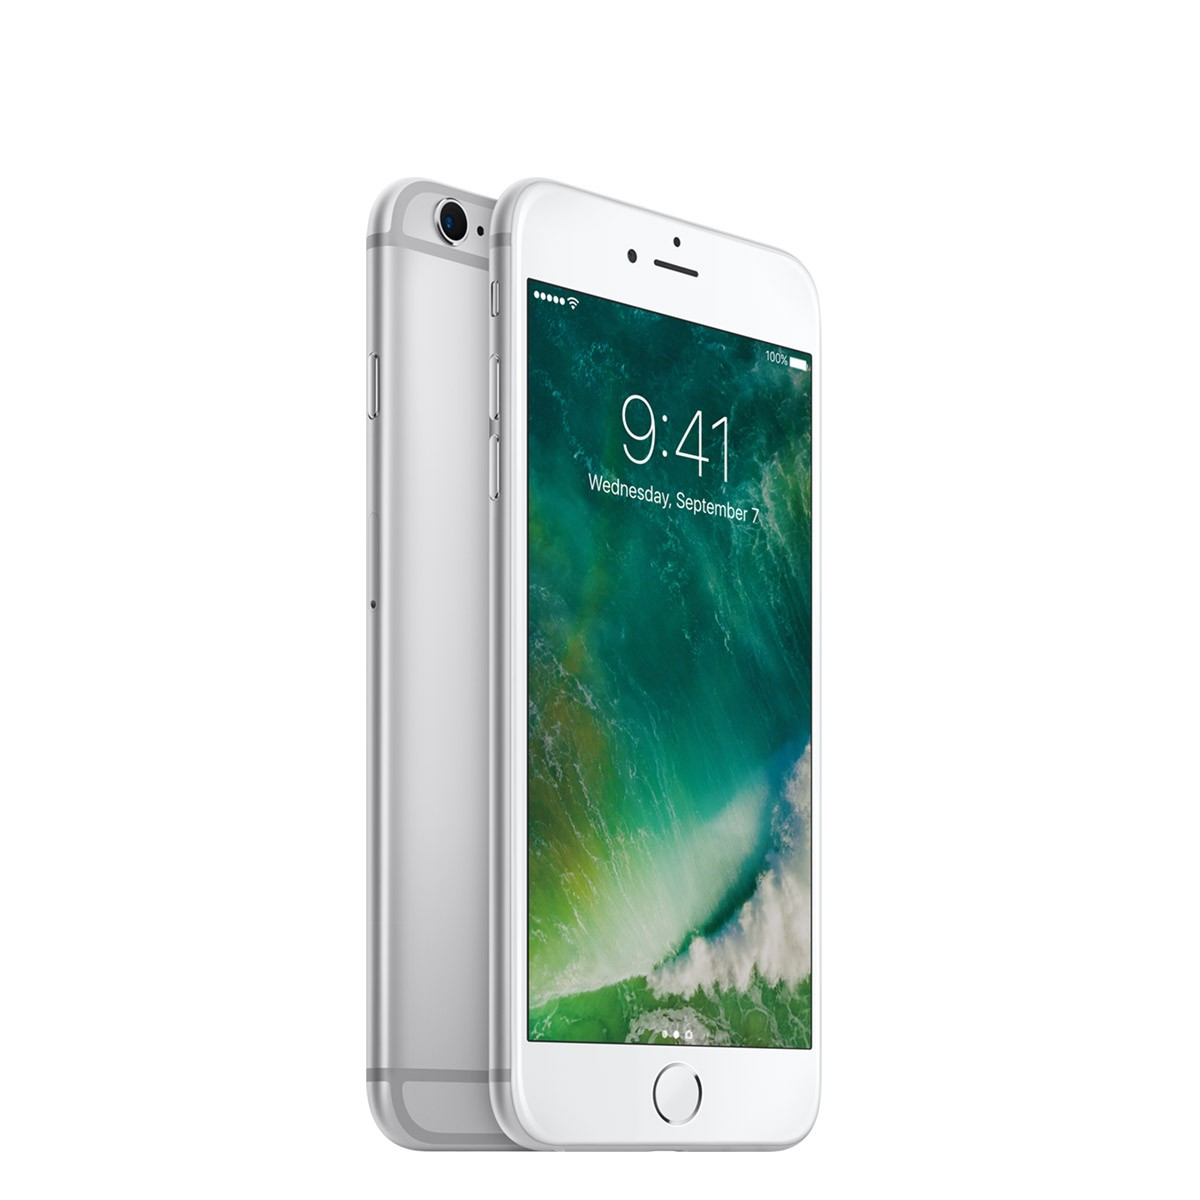 apple iphone 6 16gb silver. Black Bedroom Furniture Sets. Home Design Ideas